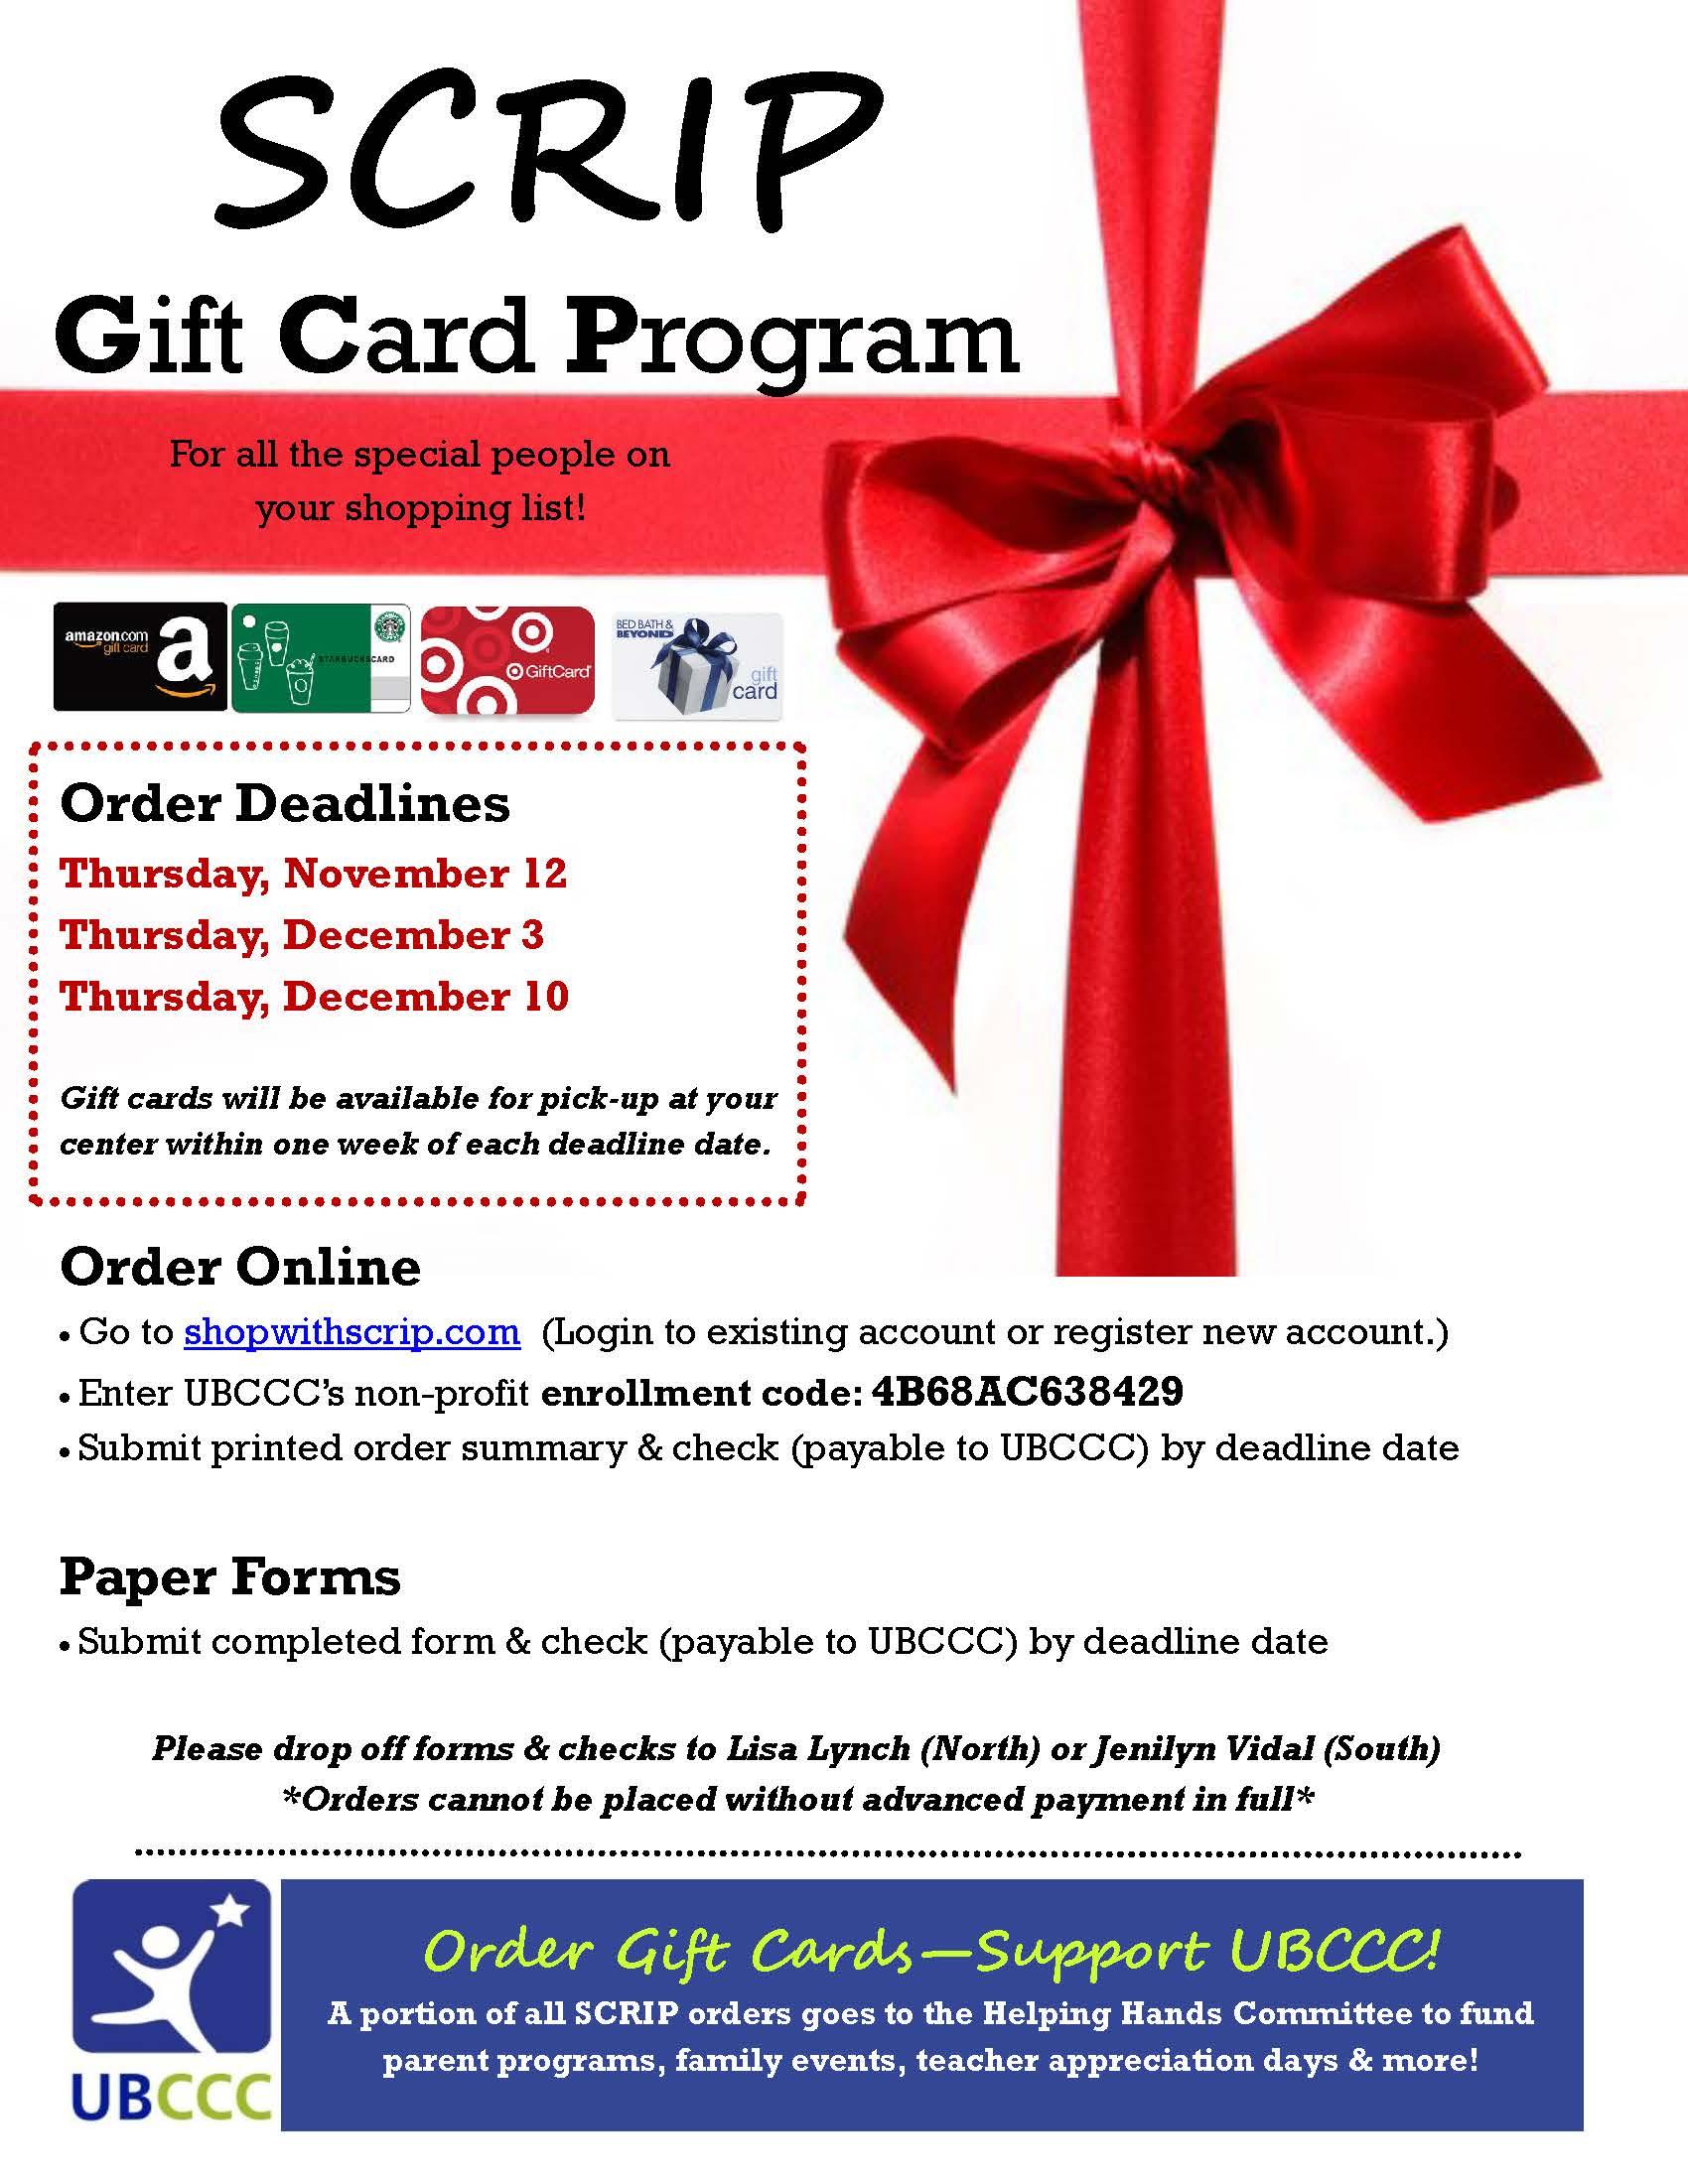 Annual SCRIP Gift Card Program - University at Buffalo Child Care ...